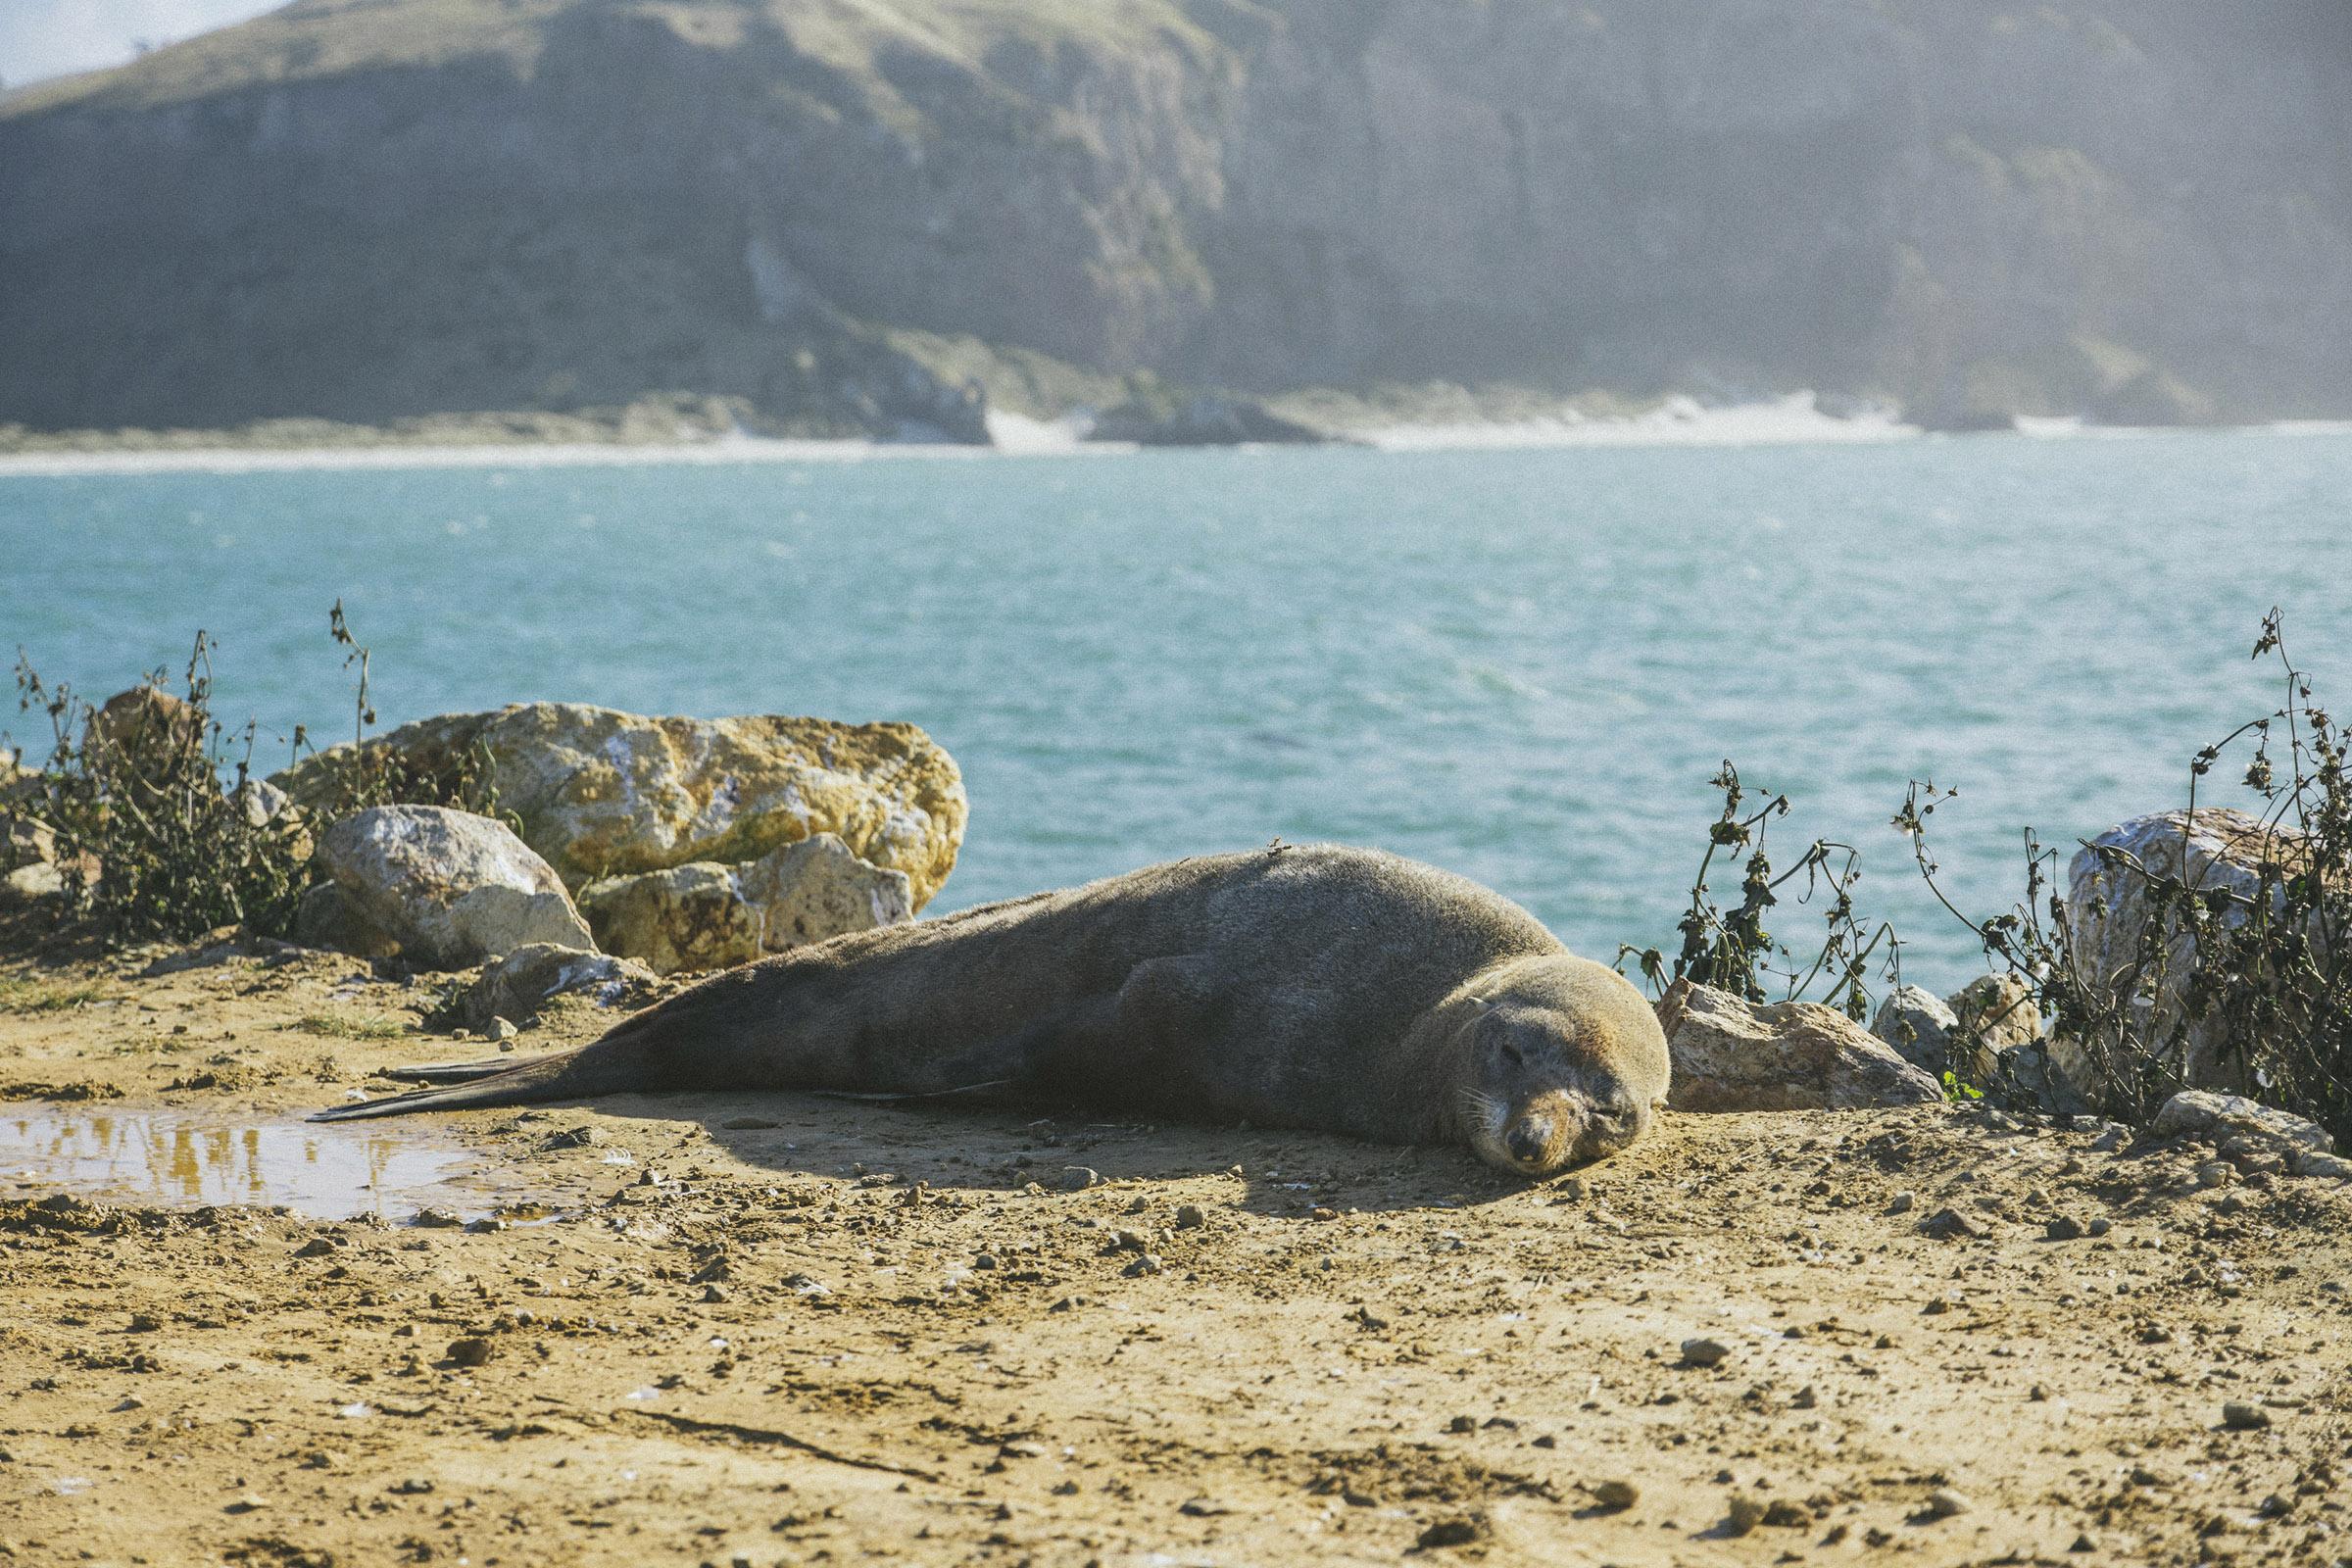 Rohan had never been close to a sealion, so I took him to the Mole at Aramoana on Otago's Peninsula